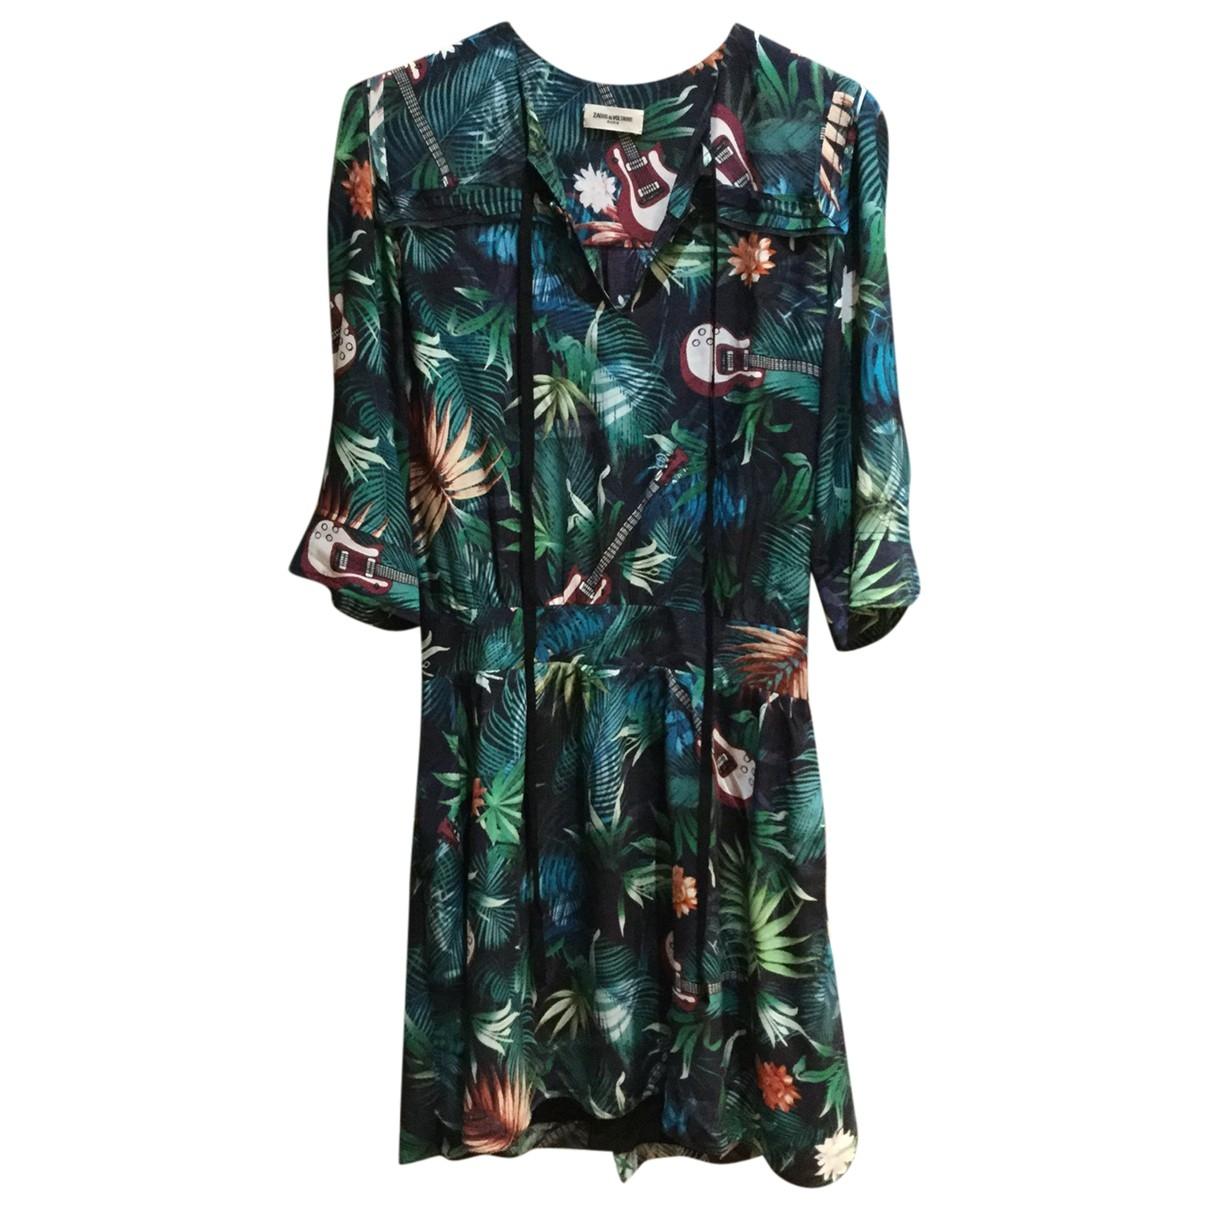 Zadig & Voltaire \N Multicolour dress for Women XS International